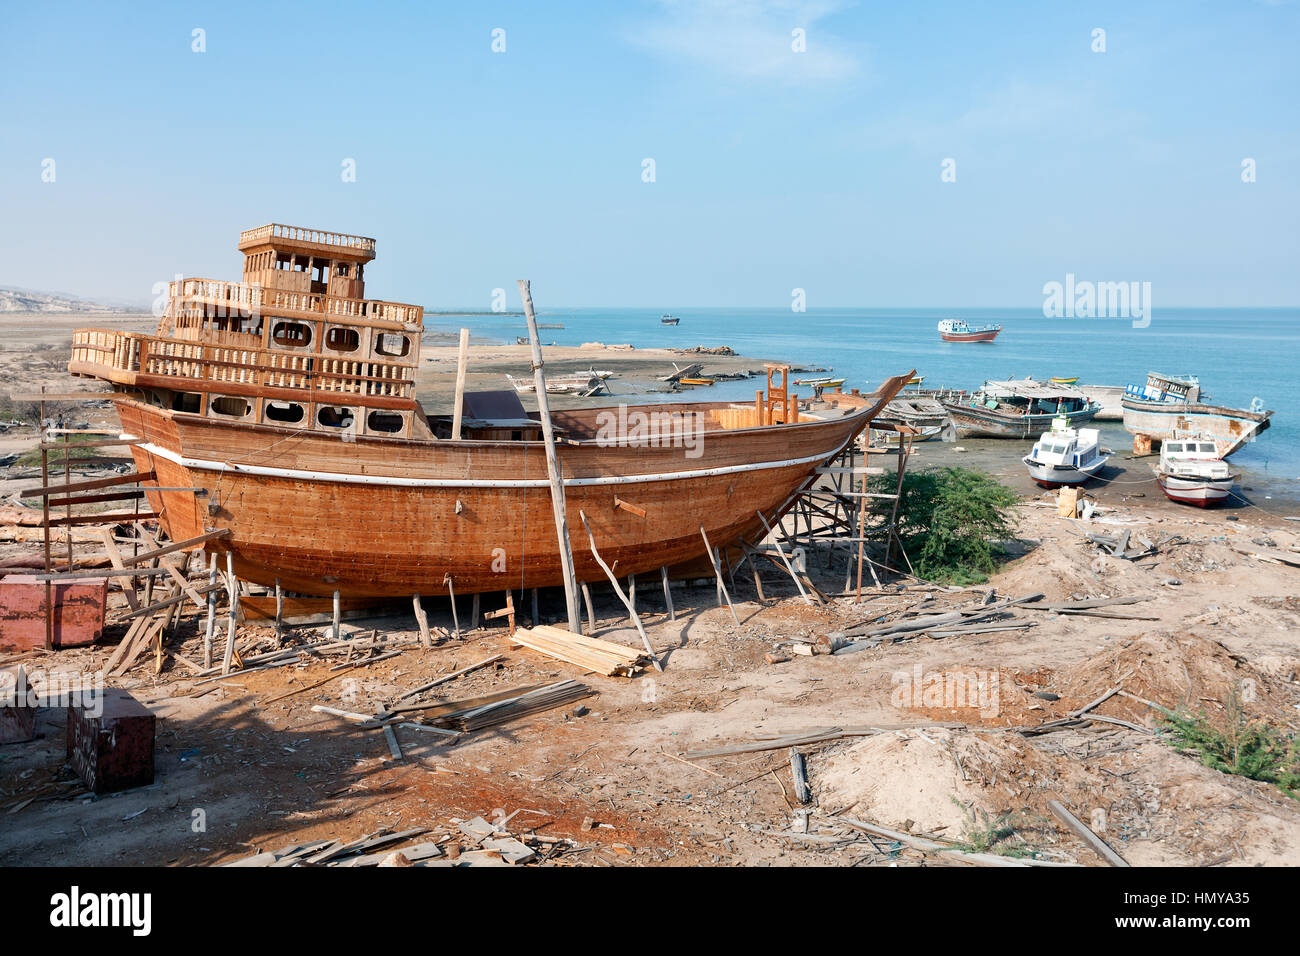 Traditional wooden cargo vessel at shipyard on Qeshm Island, Persian Gulf, Iran - Stock Image